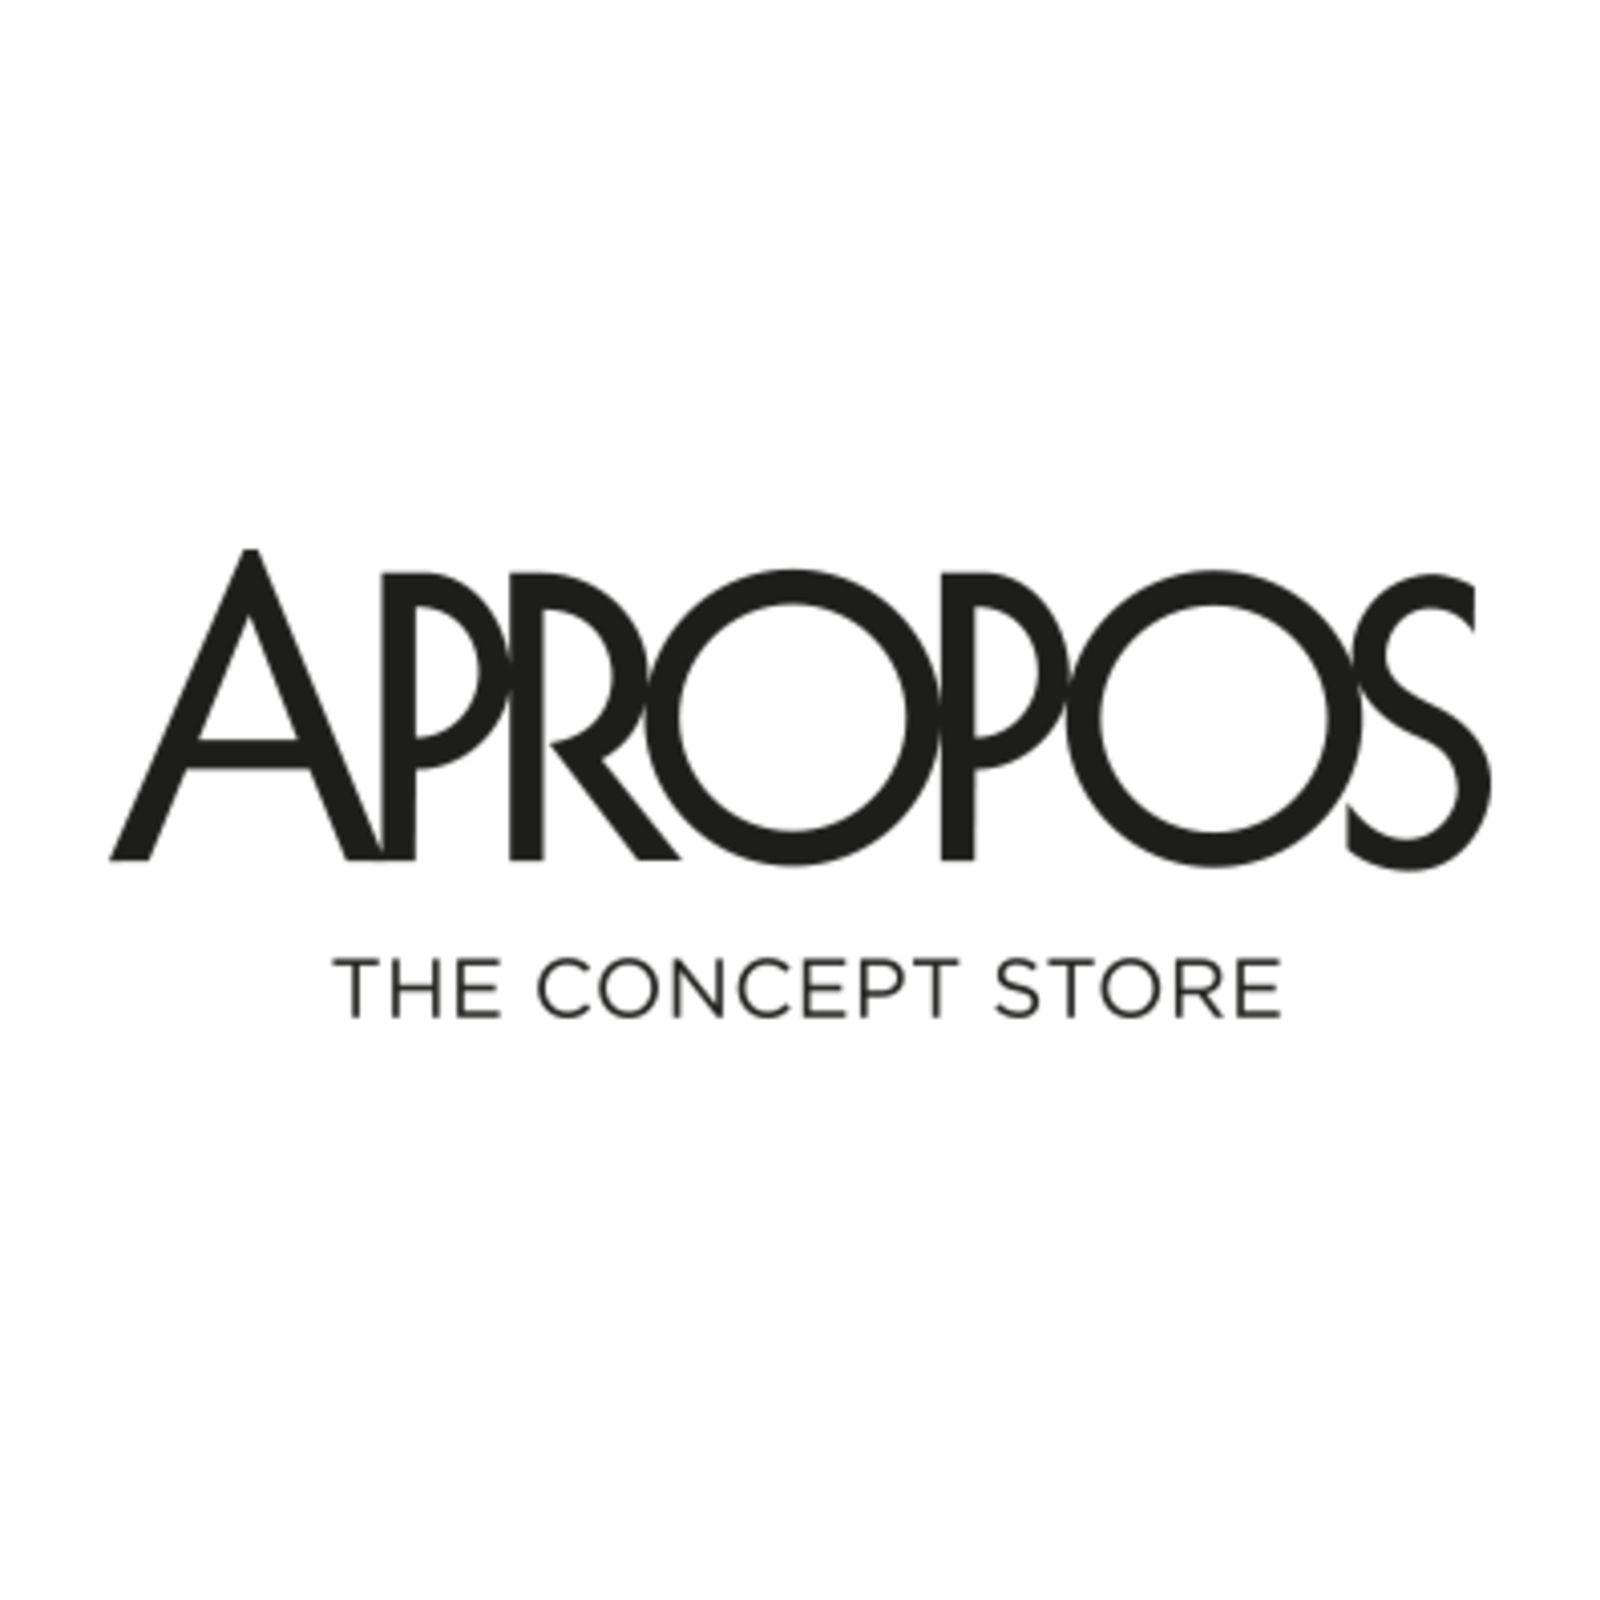 APROPOS The Concept Store in Düsseldorf (Bild 1)